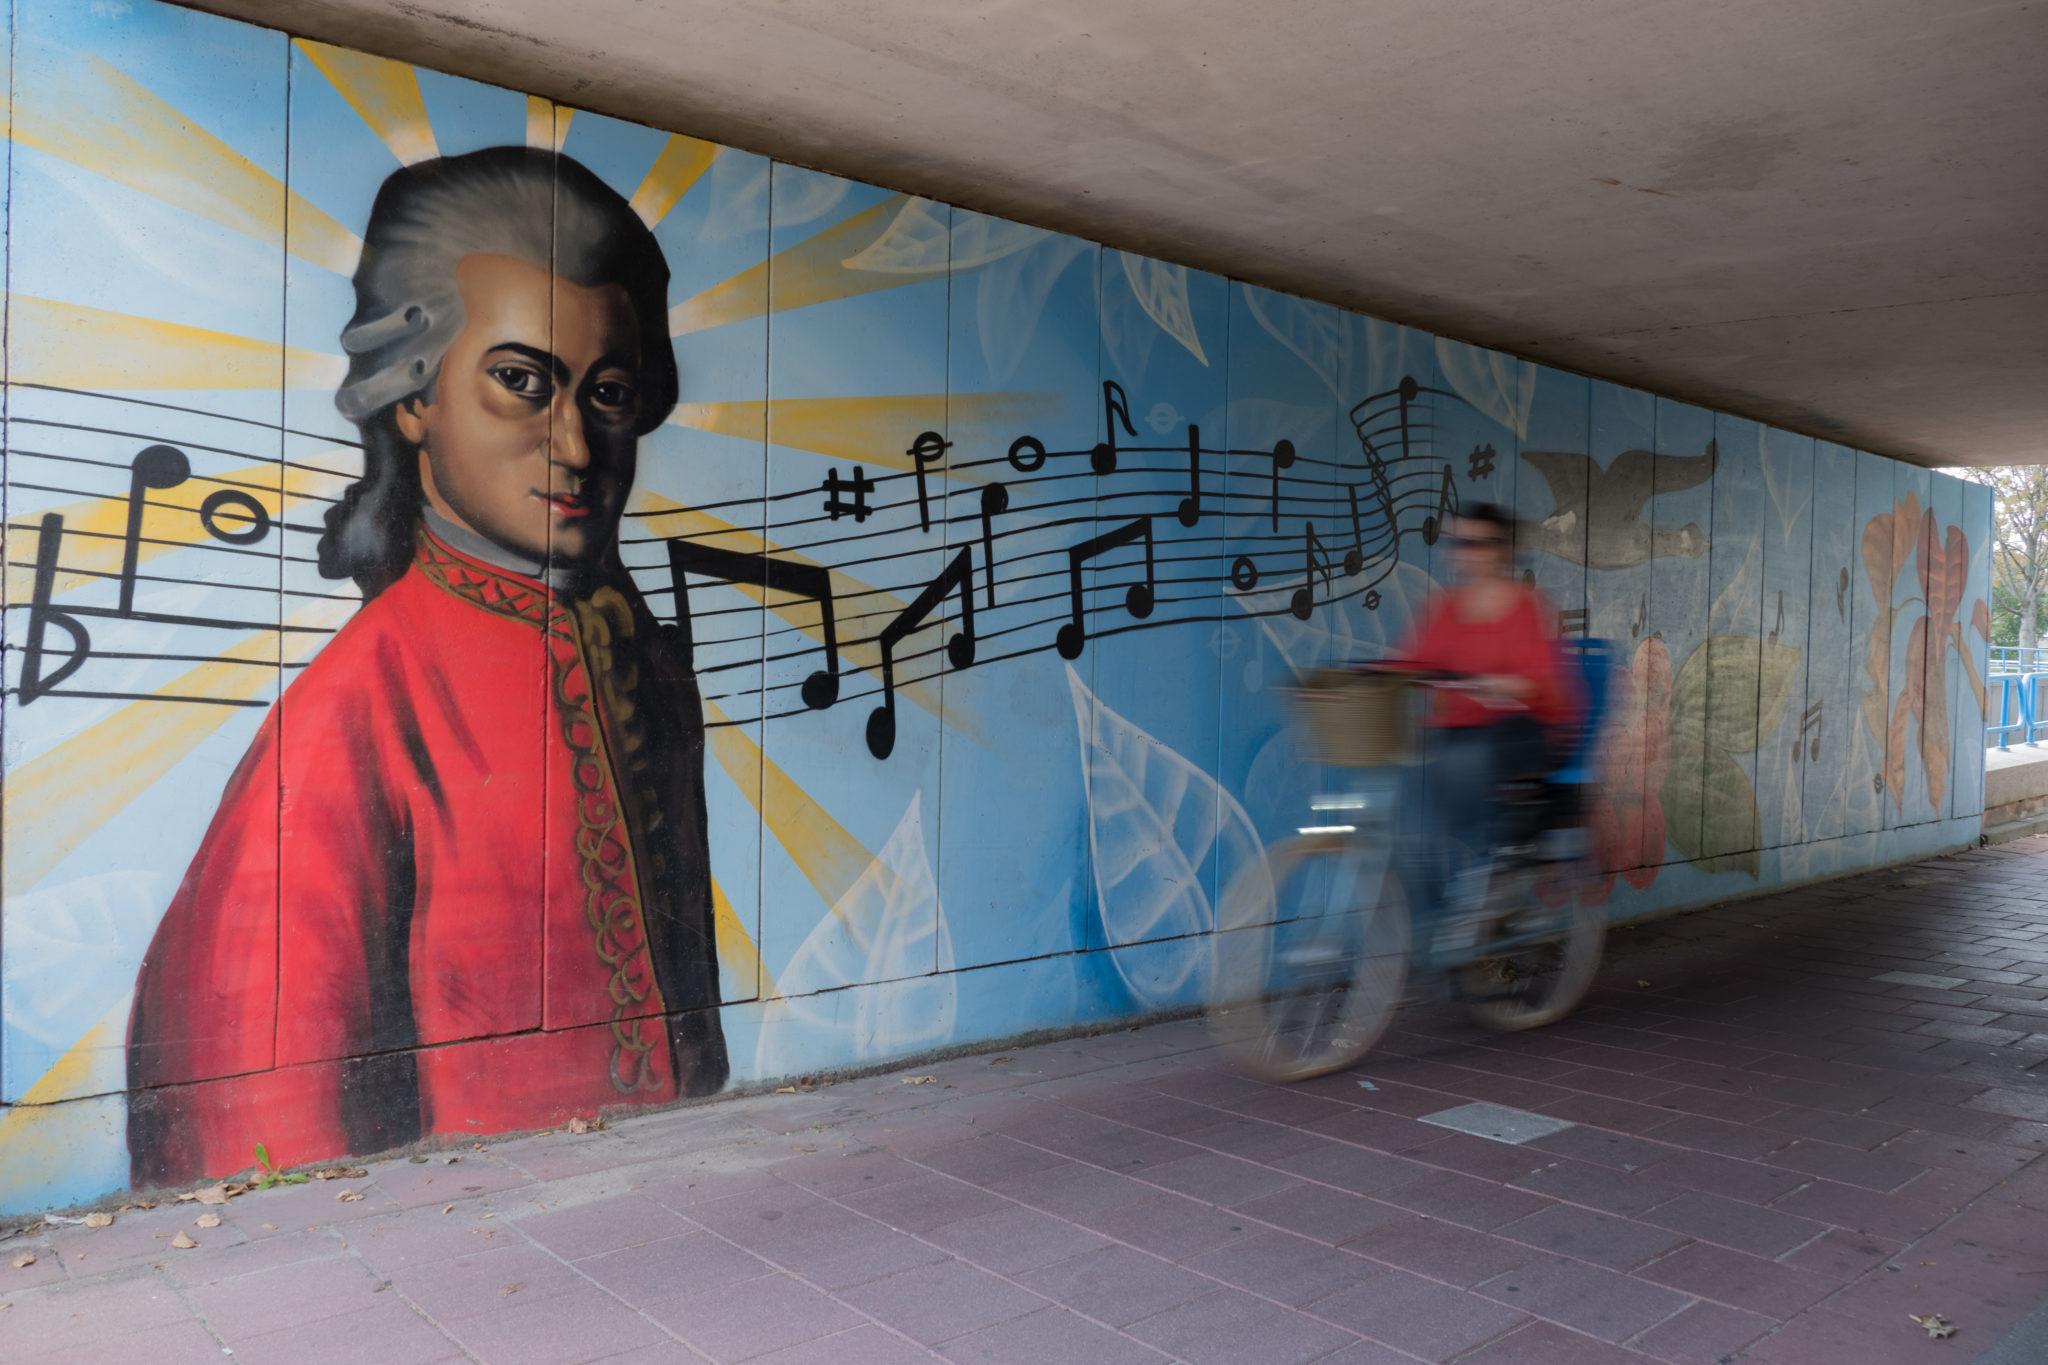 Tunnel met graffiti kunst in Waddinxveen